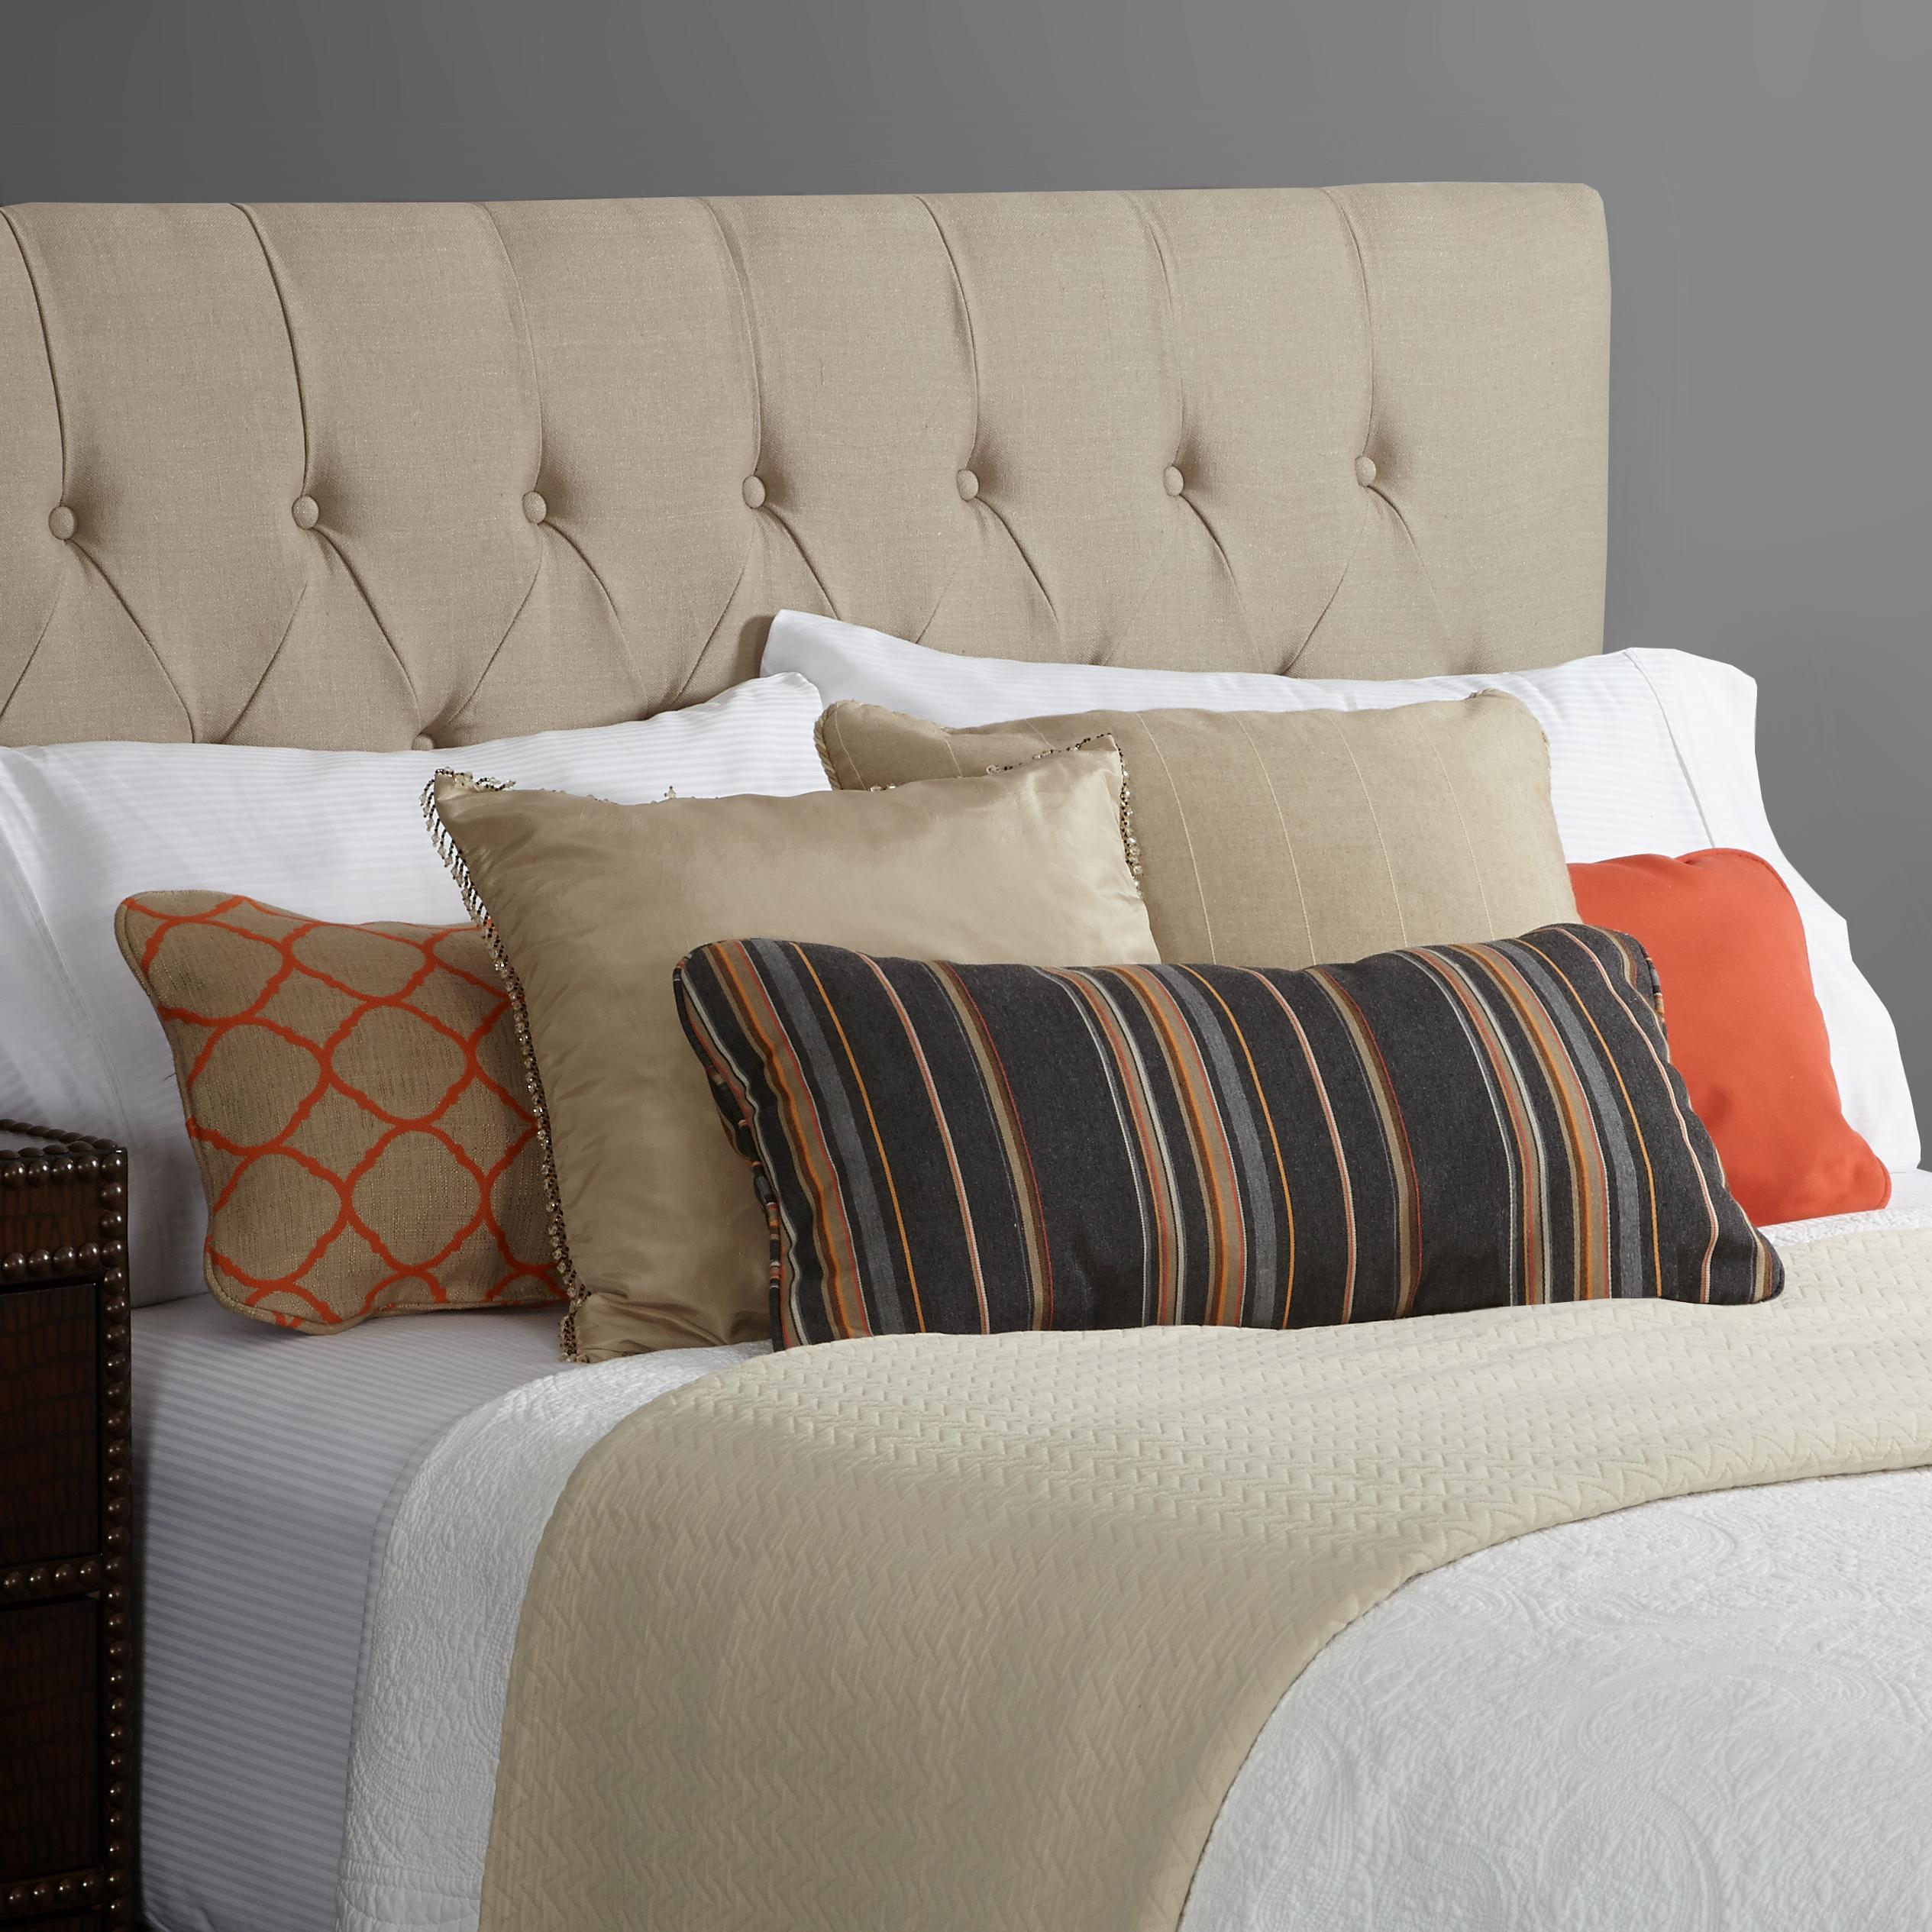 humble haute harlow linen diamond tufted. Black Bedroom Furniture Sets. Home Design Ideas